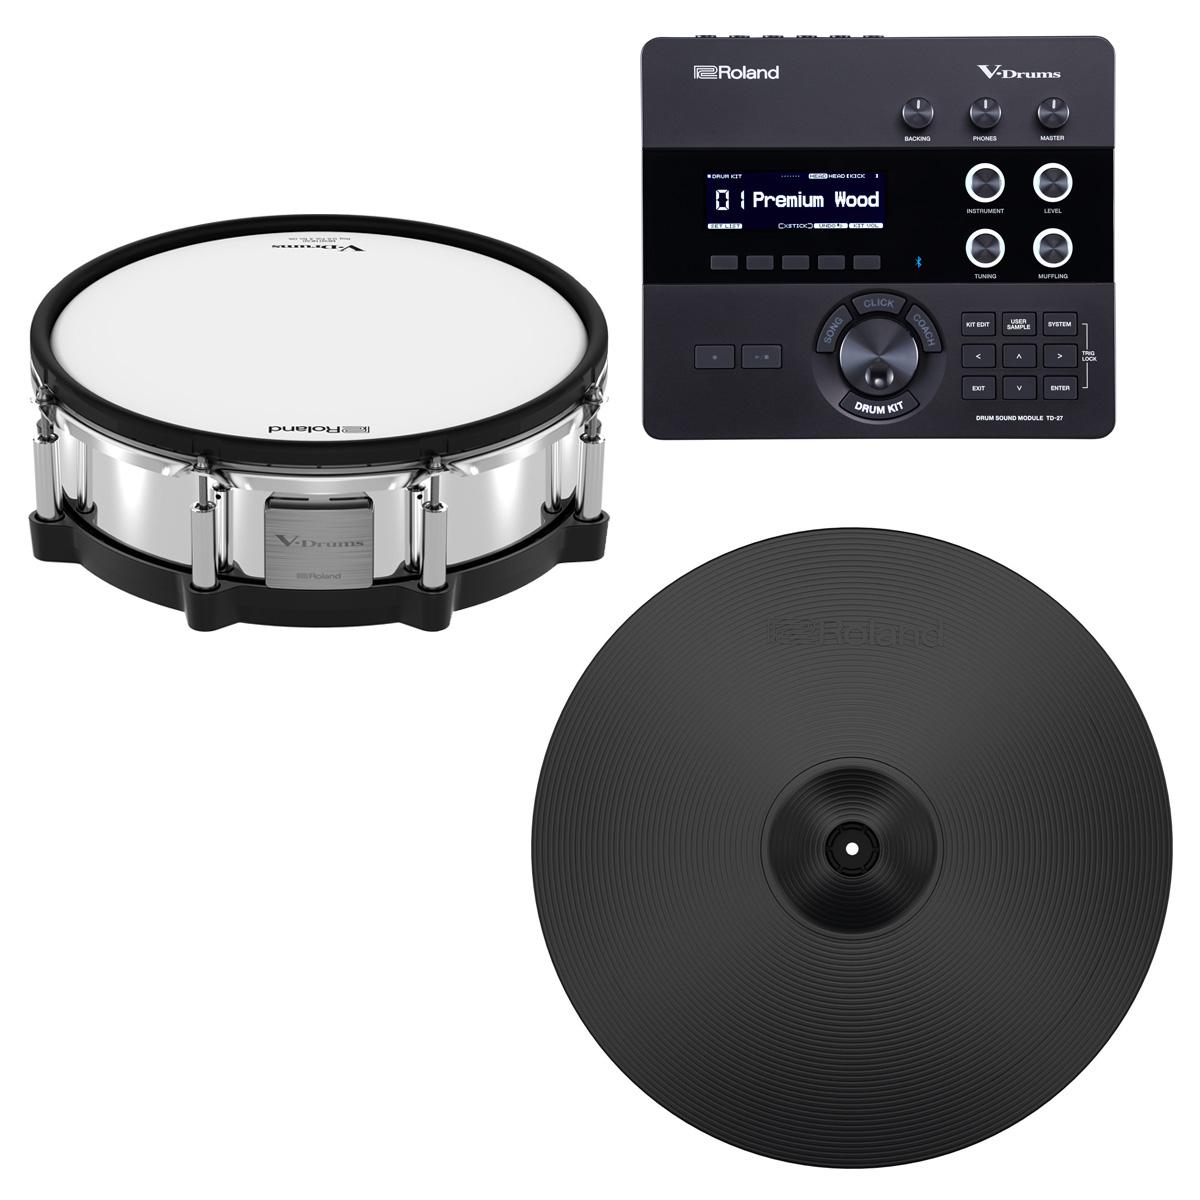 Roland / TD-27 ドラム音源モジュール PD-140DS CY-18DR デジタルパッドセット V-Drums Digital Pad Package【YRK】